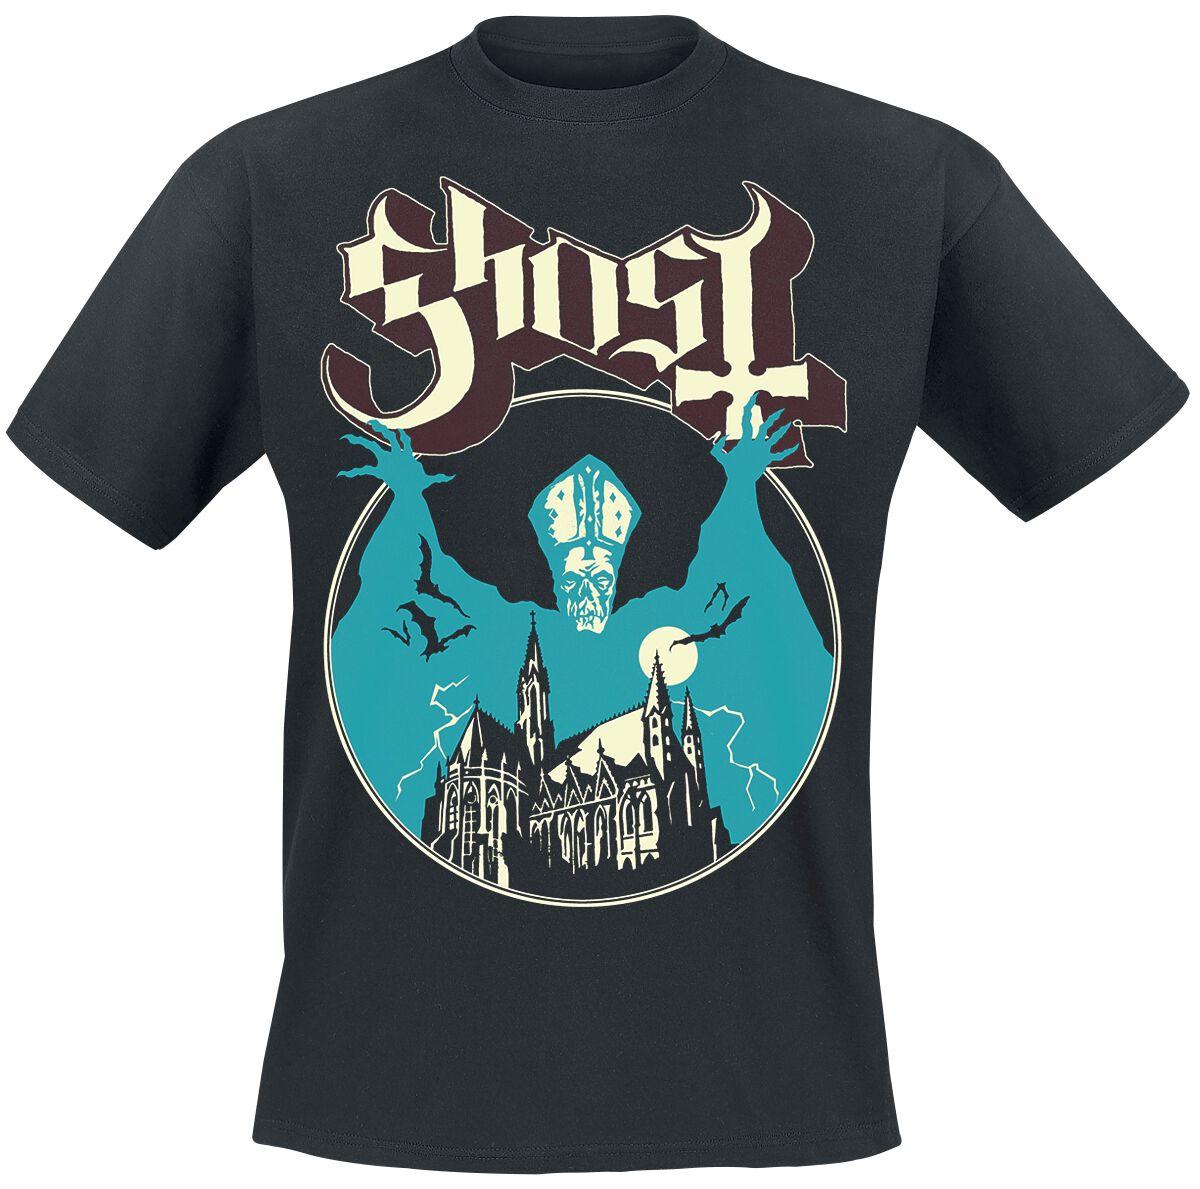 Zespoły - Koszulki - T-Shirt Ghost Opus T-Shirt czarny - 322512